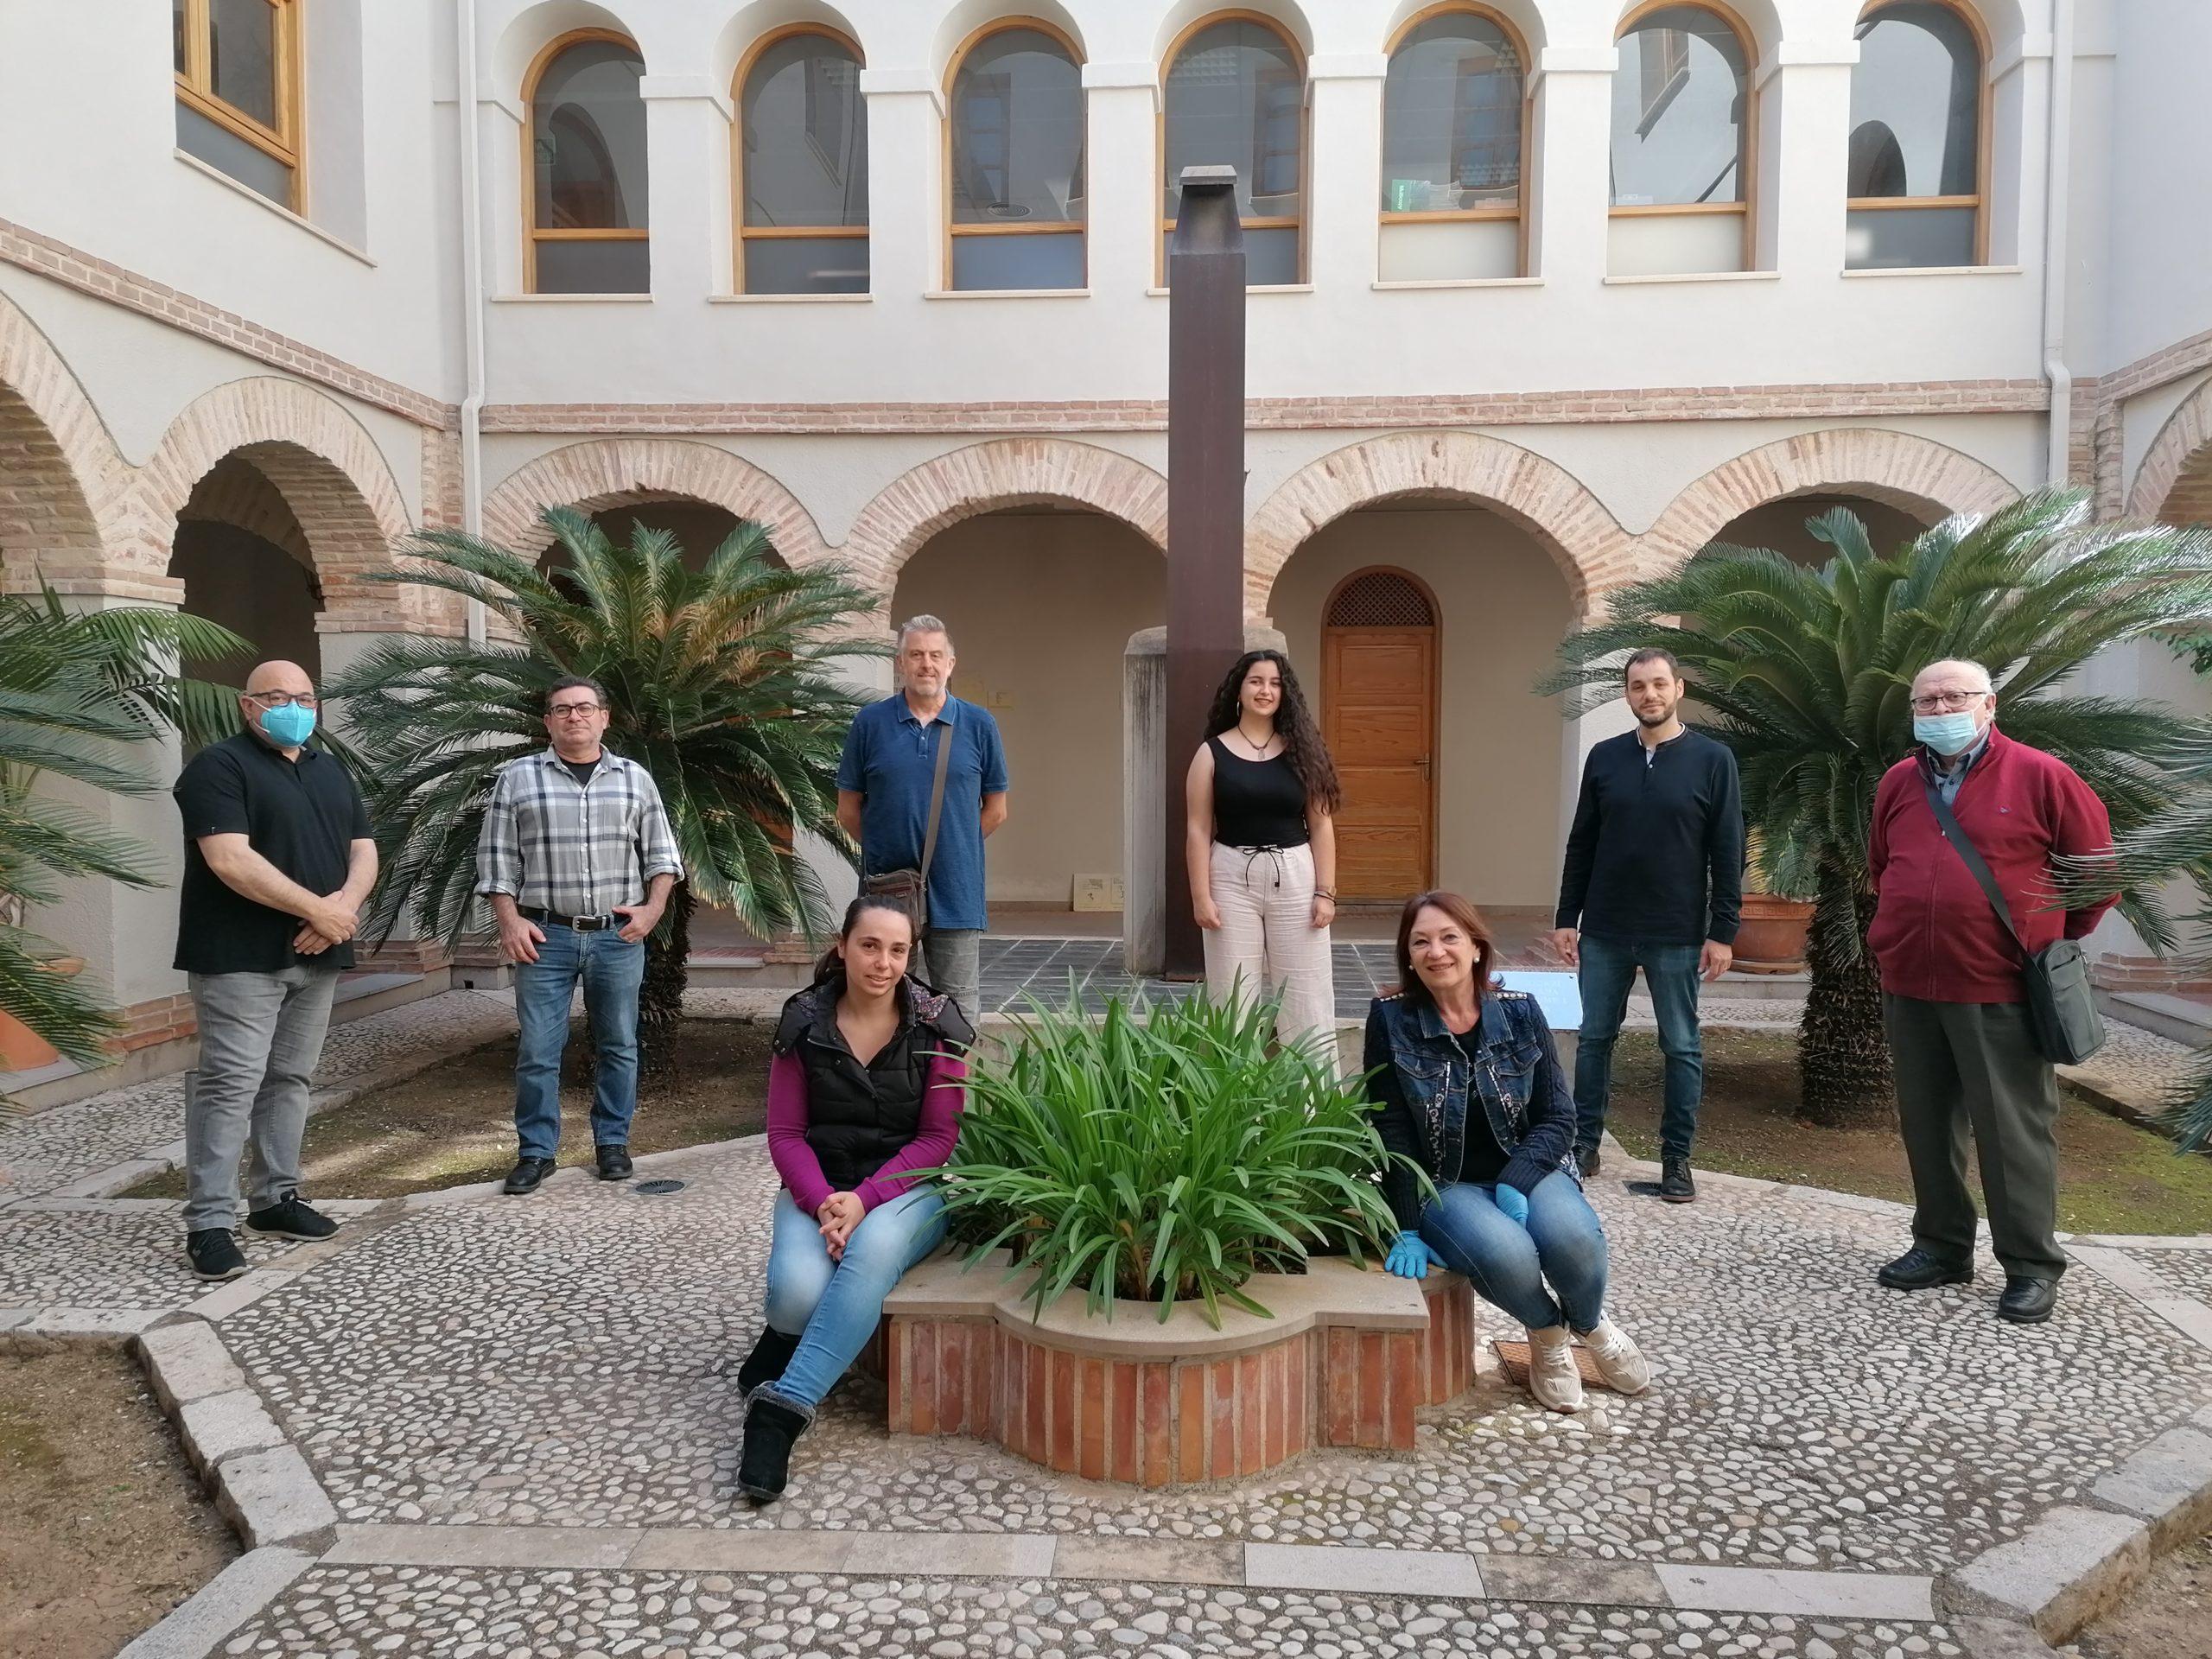 fiestas populares Sant Jaume 2020